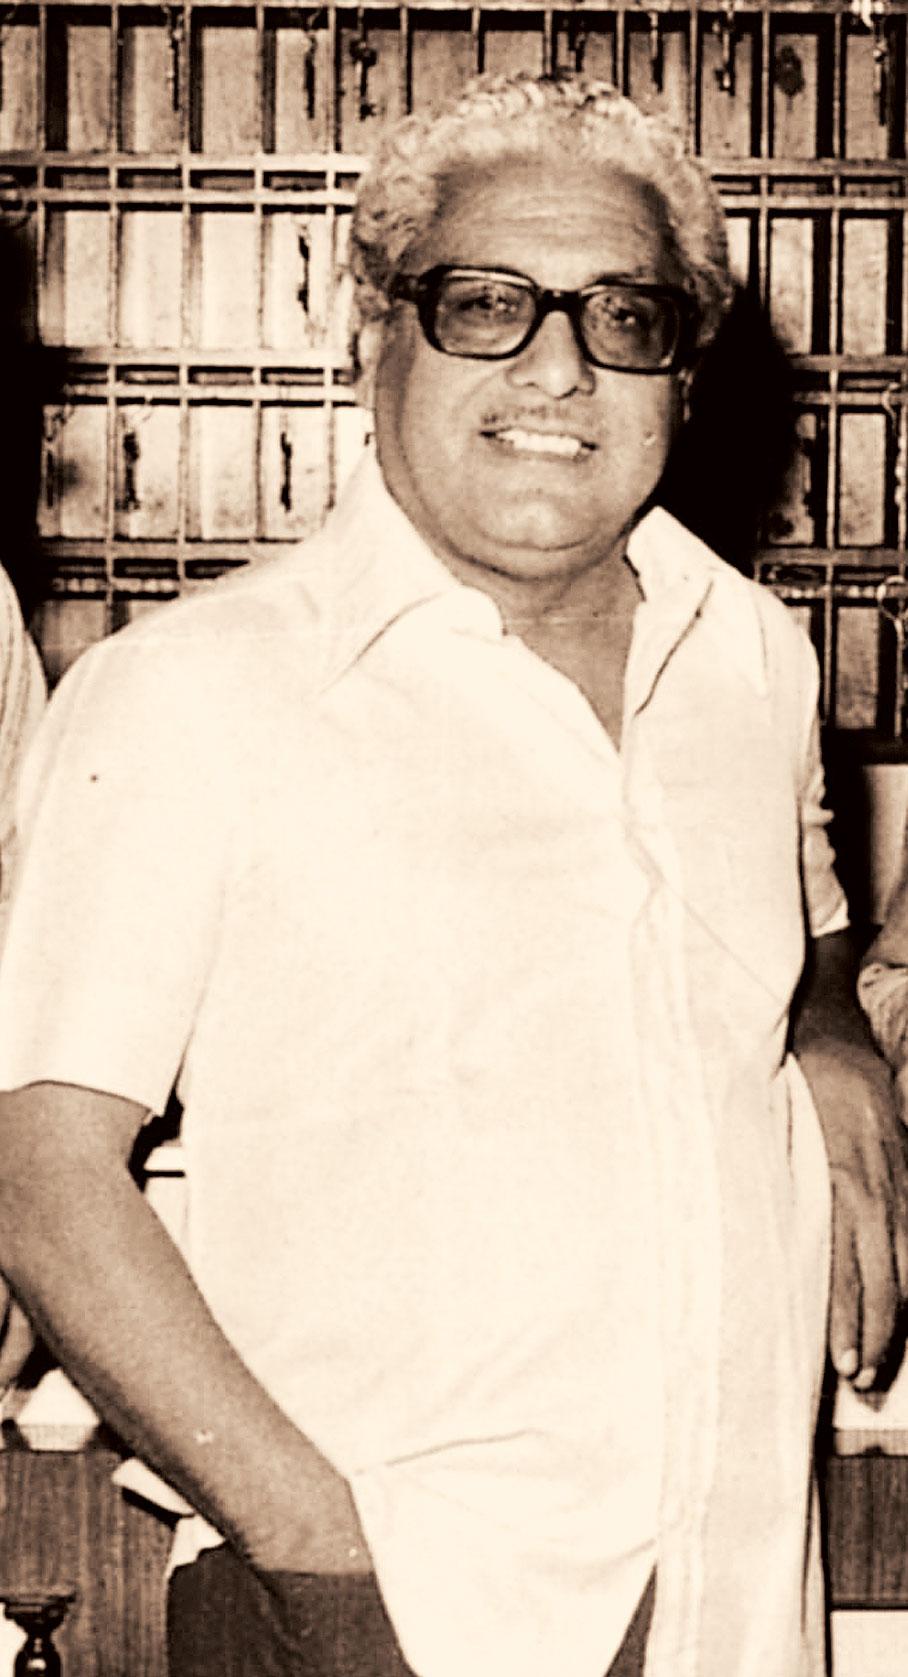 Basu Chatterjee